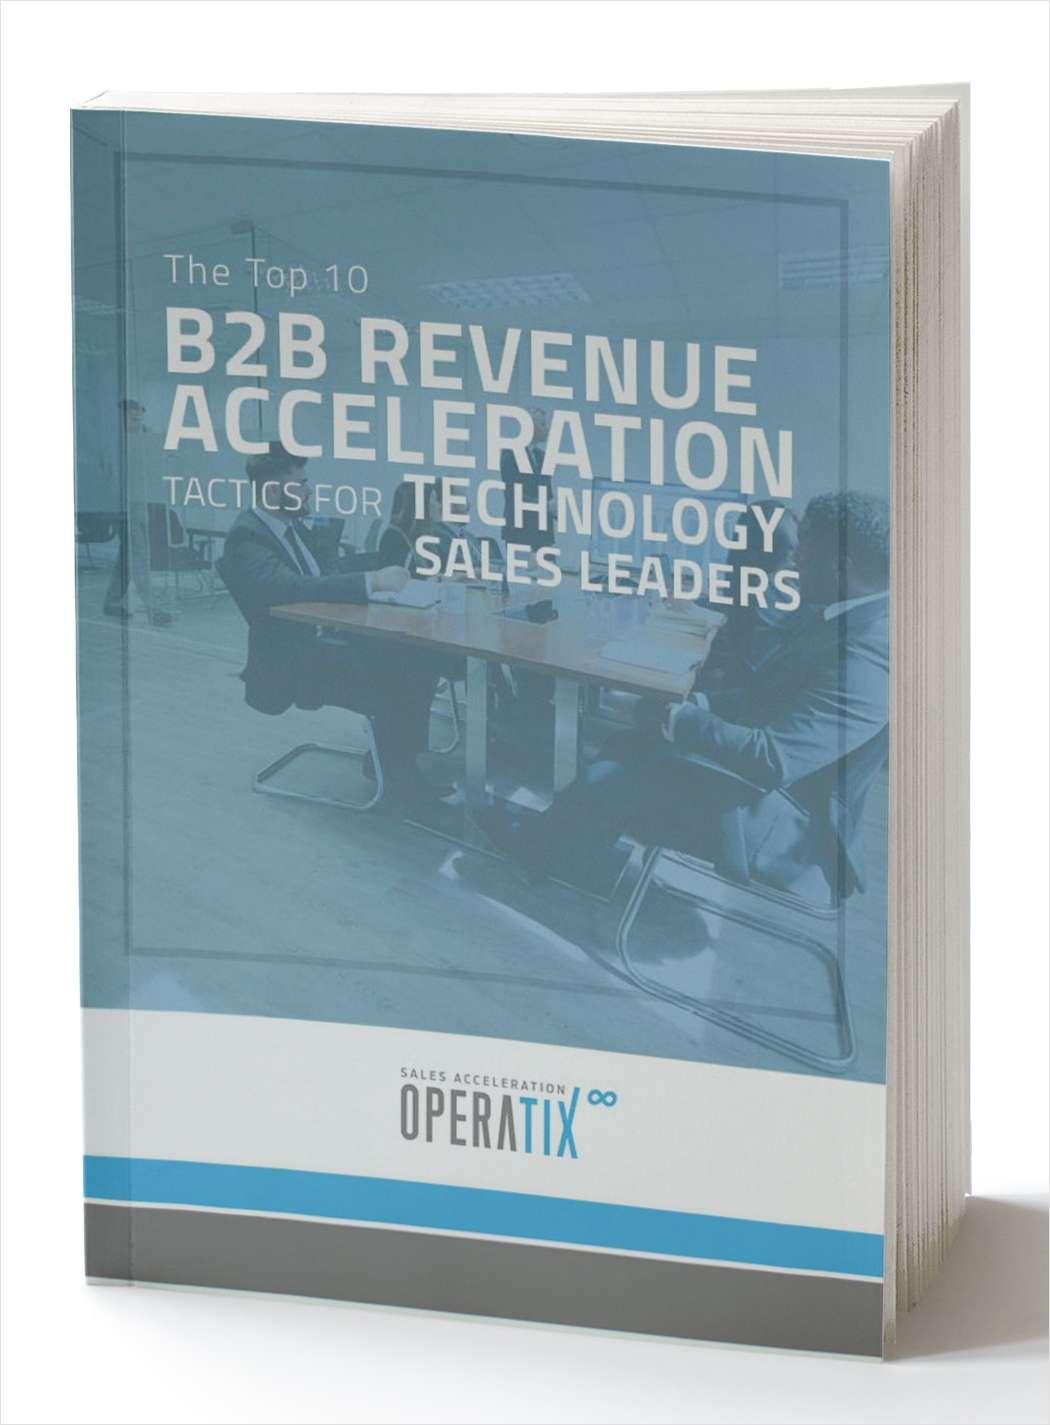 B2B Revenue Acceleration Tactics for Technology Sales Leaders